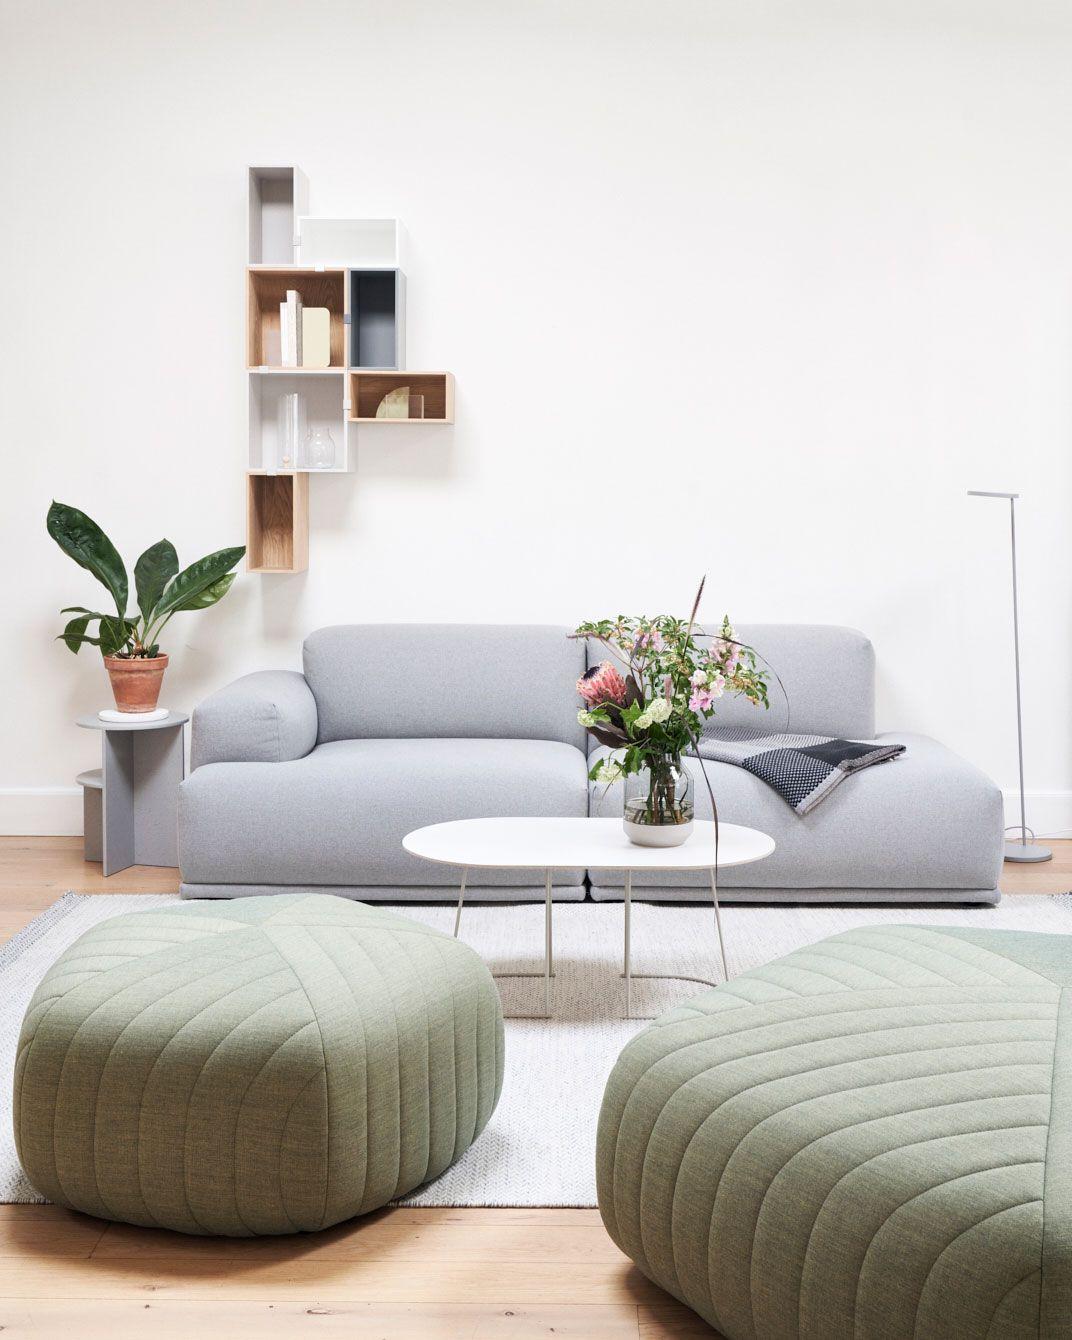 Modern And Comfortable Scandinavian Modular Sofa Inspiration From